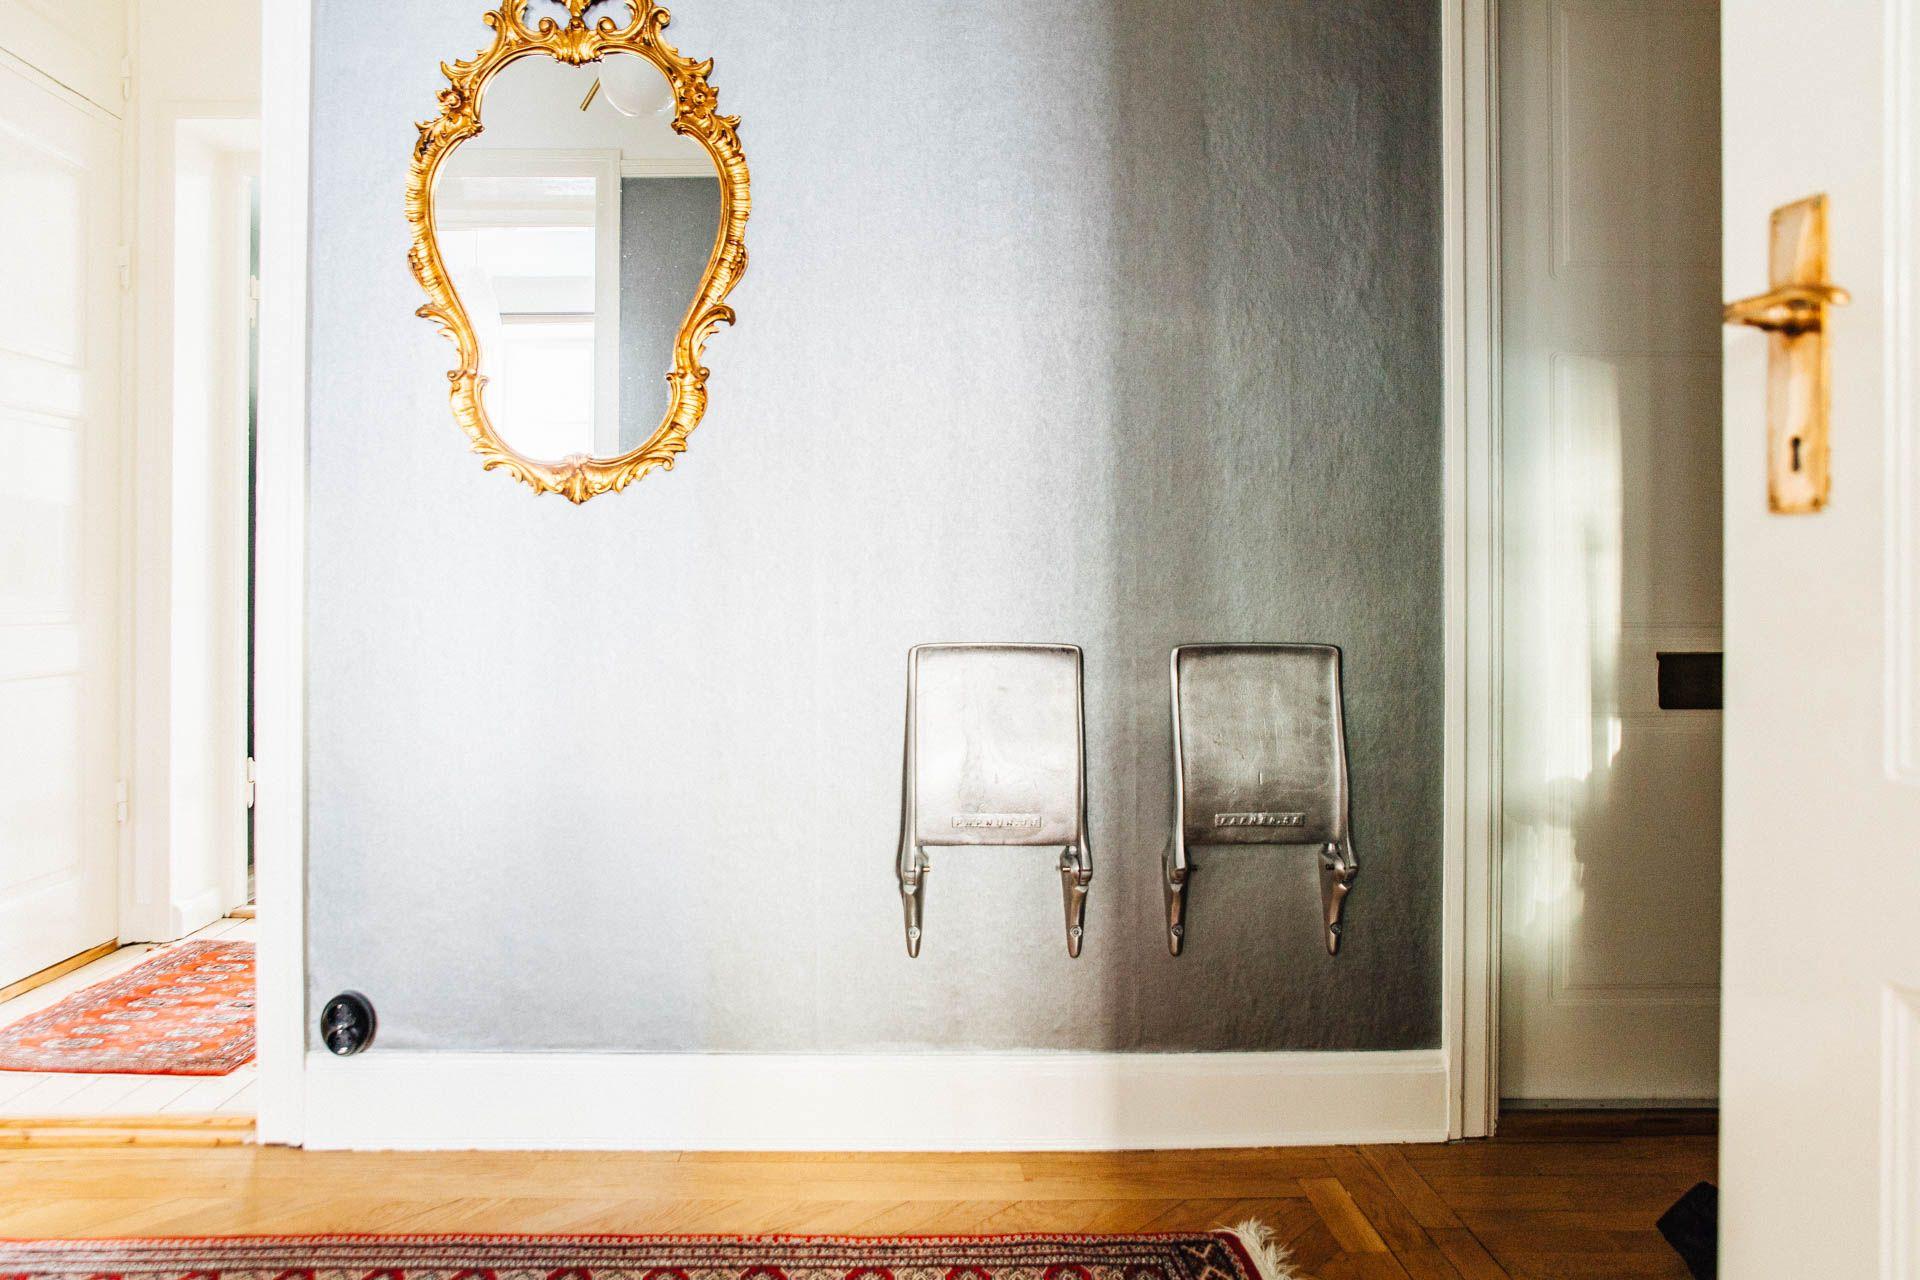 Nooks vill sakta ner stockholms bostadsmarknad. hemmen som finns ...